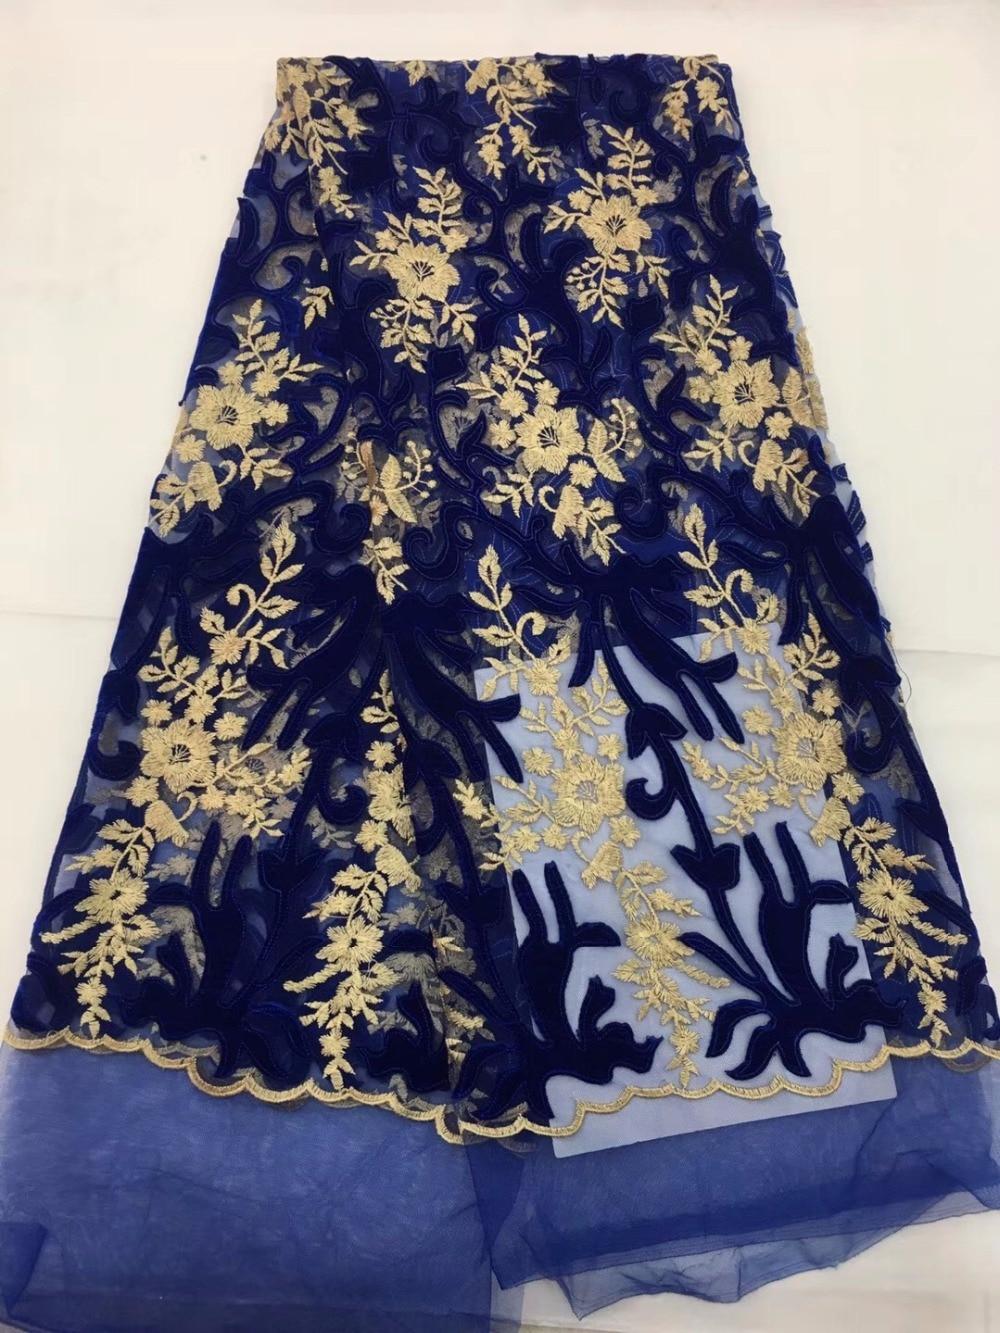 Embroidered Mesh Tulle Lace Fabric 2018 New Design Evening Dress Net velvet Fabrics